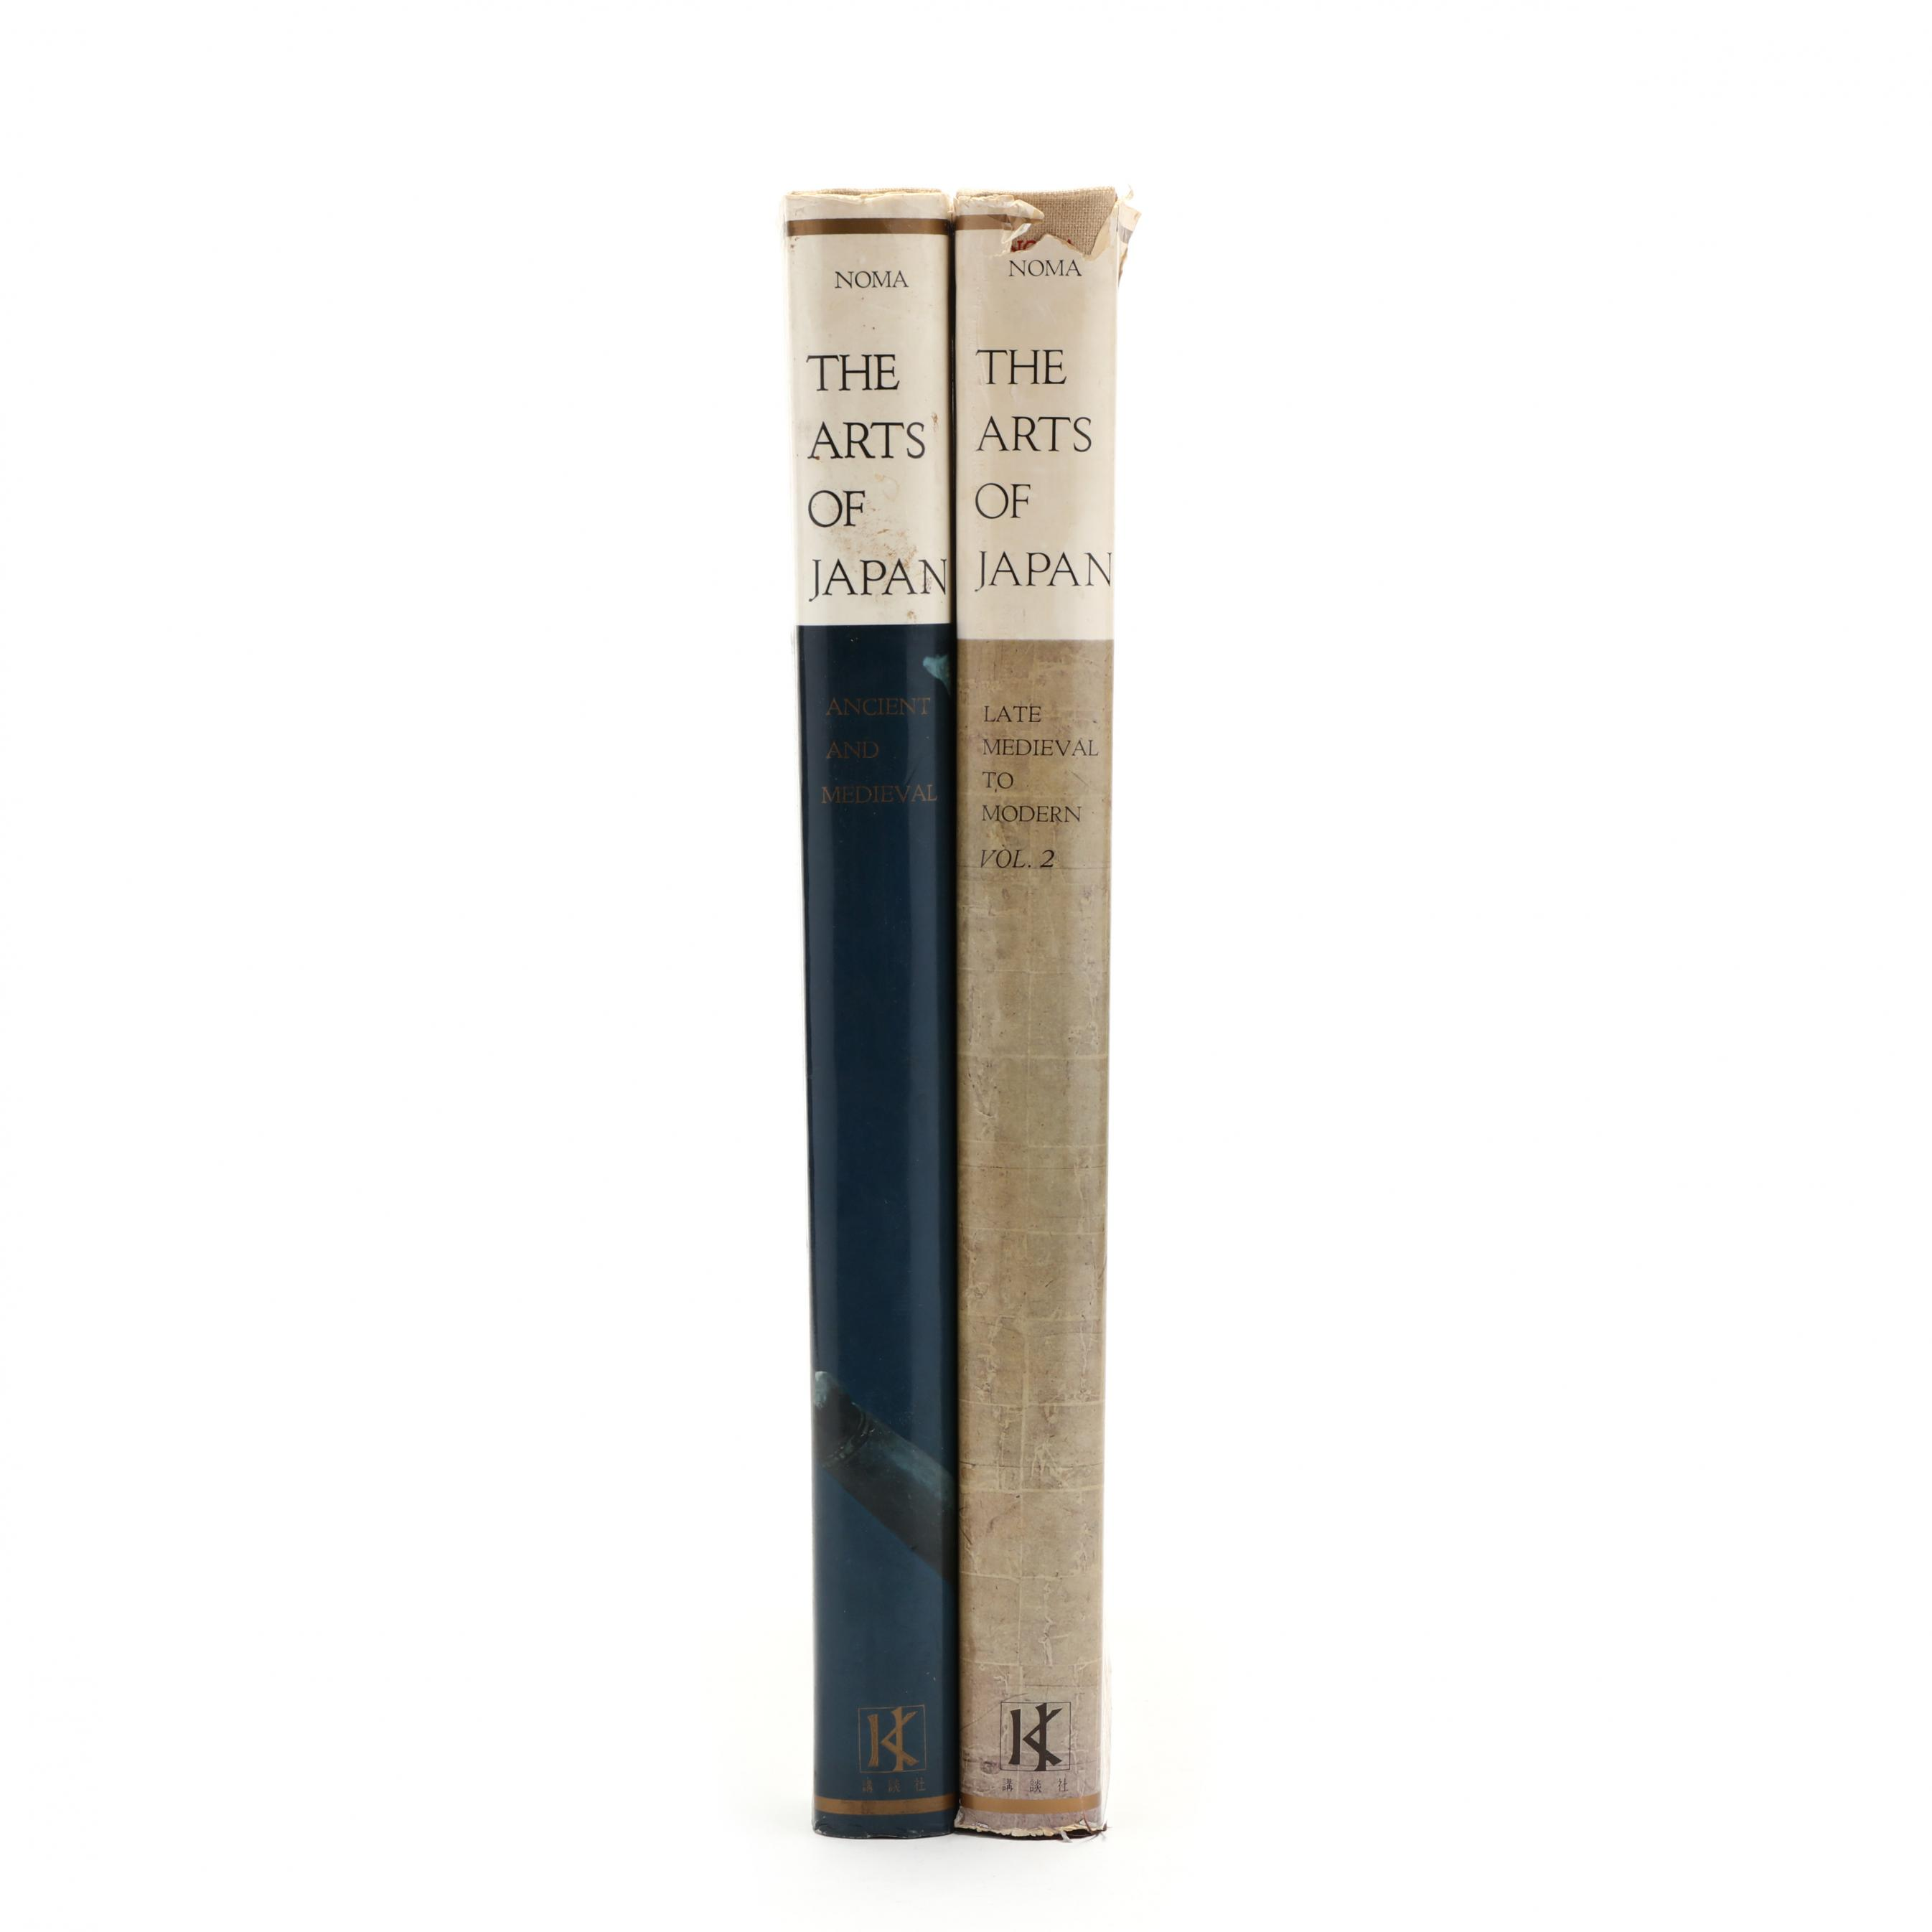 seiroku-noma-i-the-arts-of-japan-i-two-volume-set